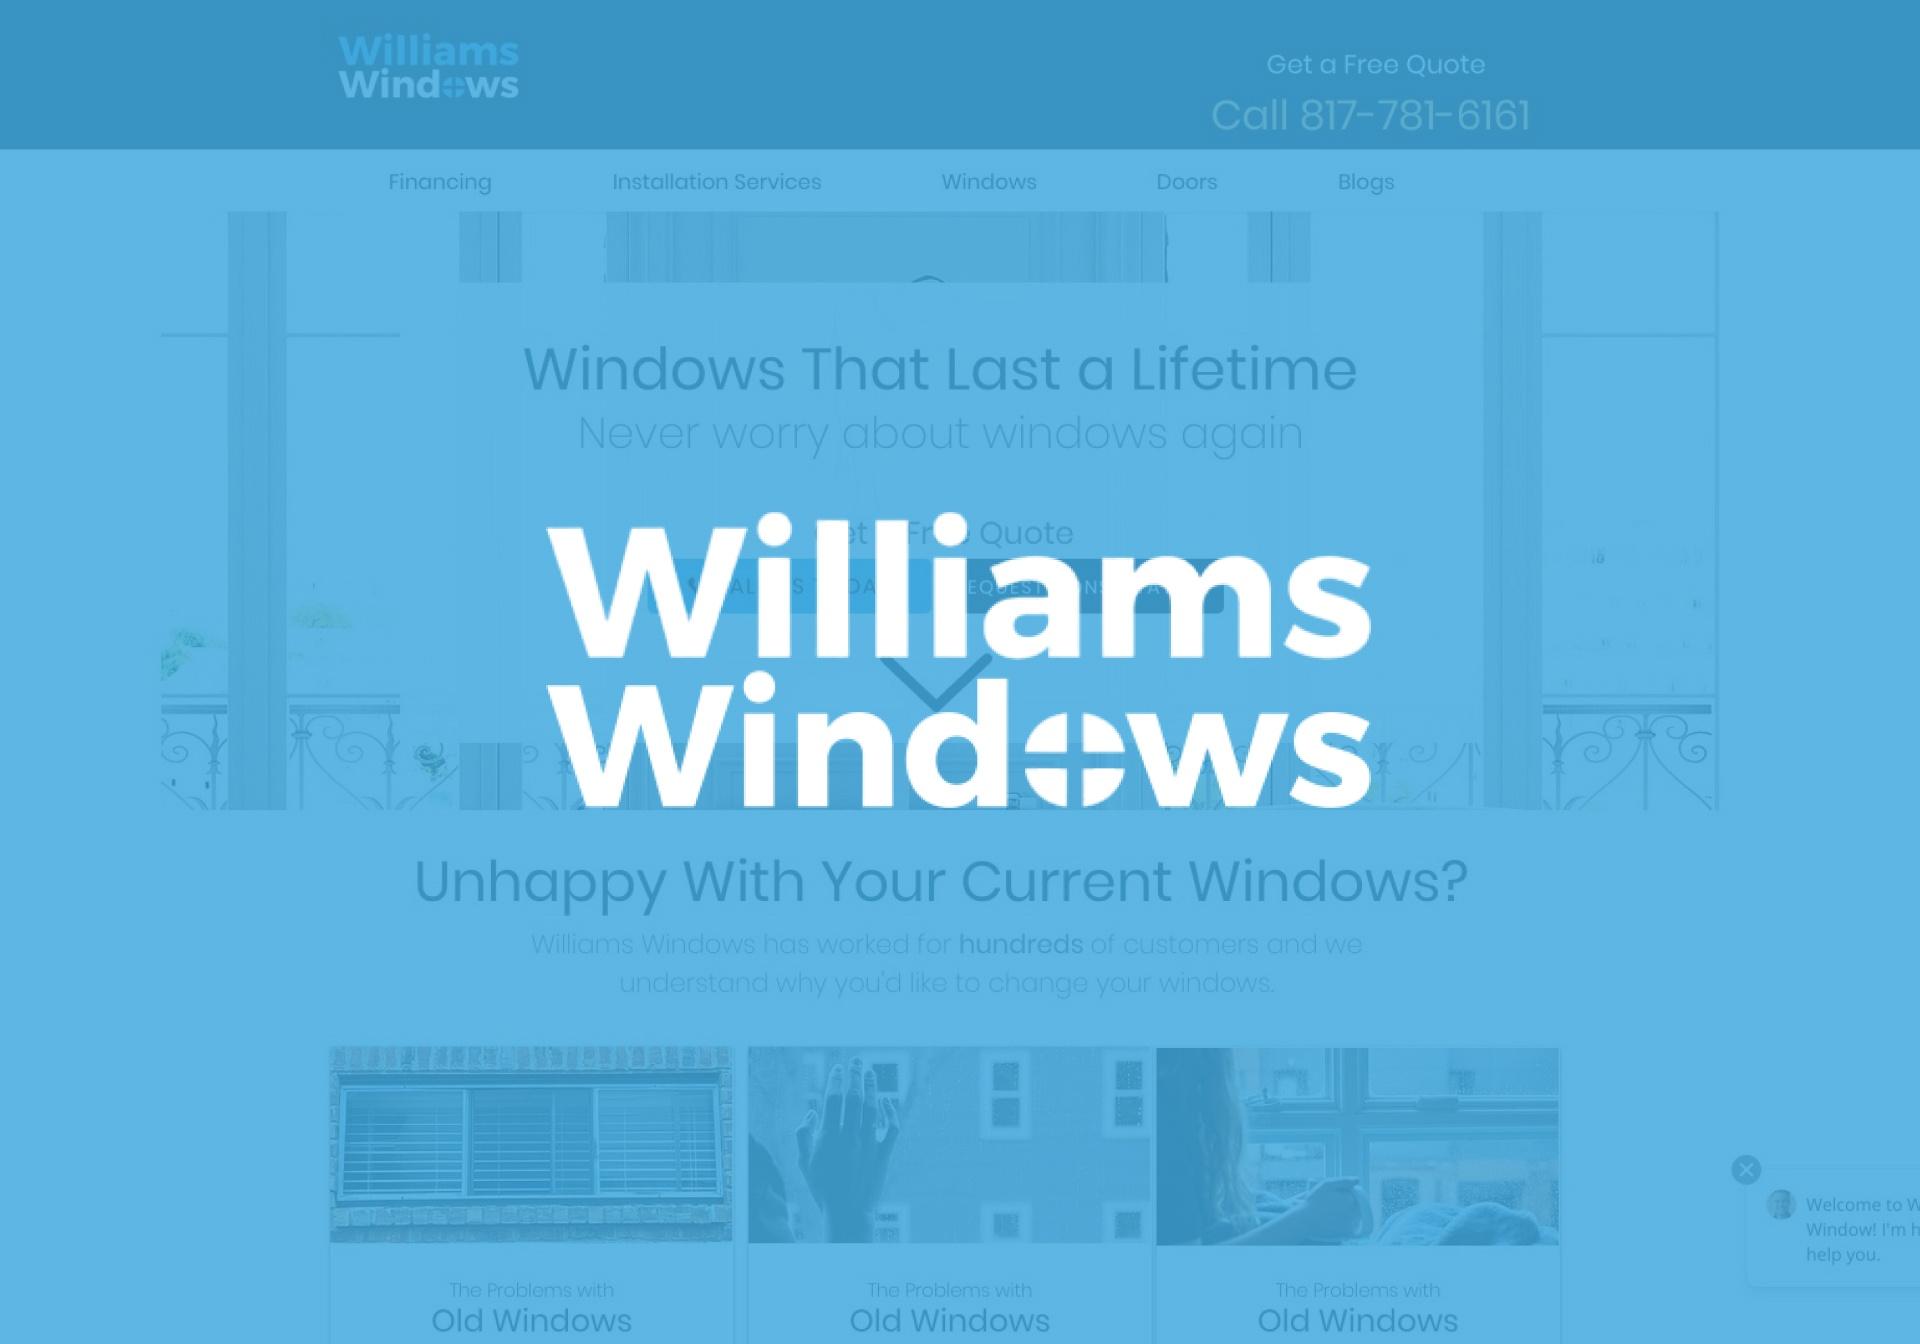 Williams Windows